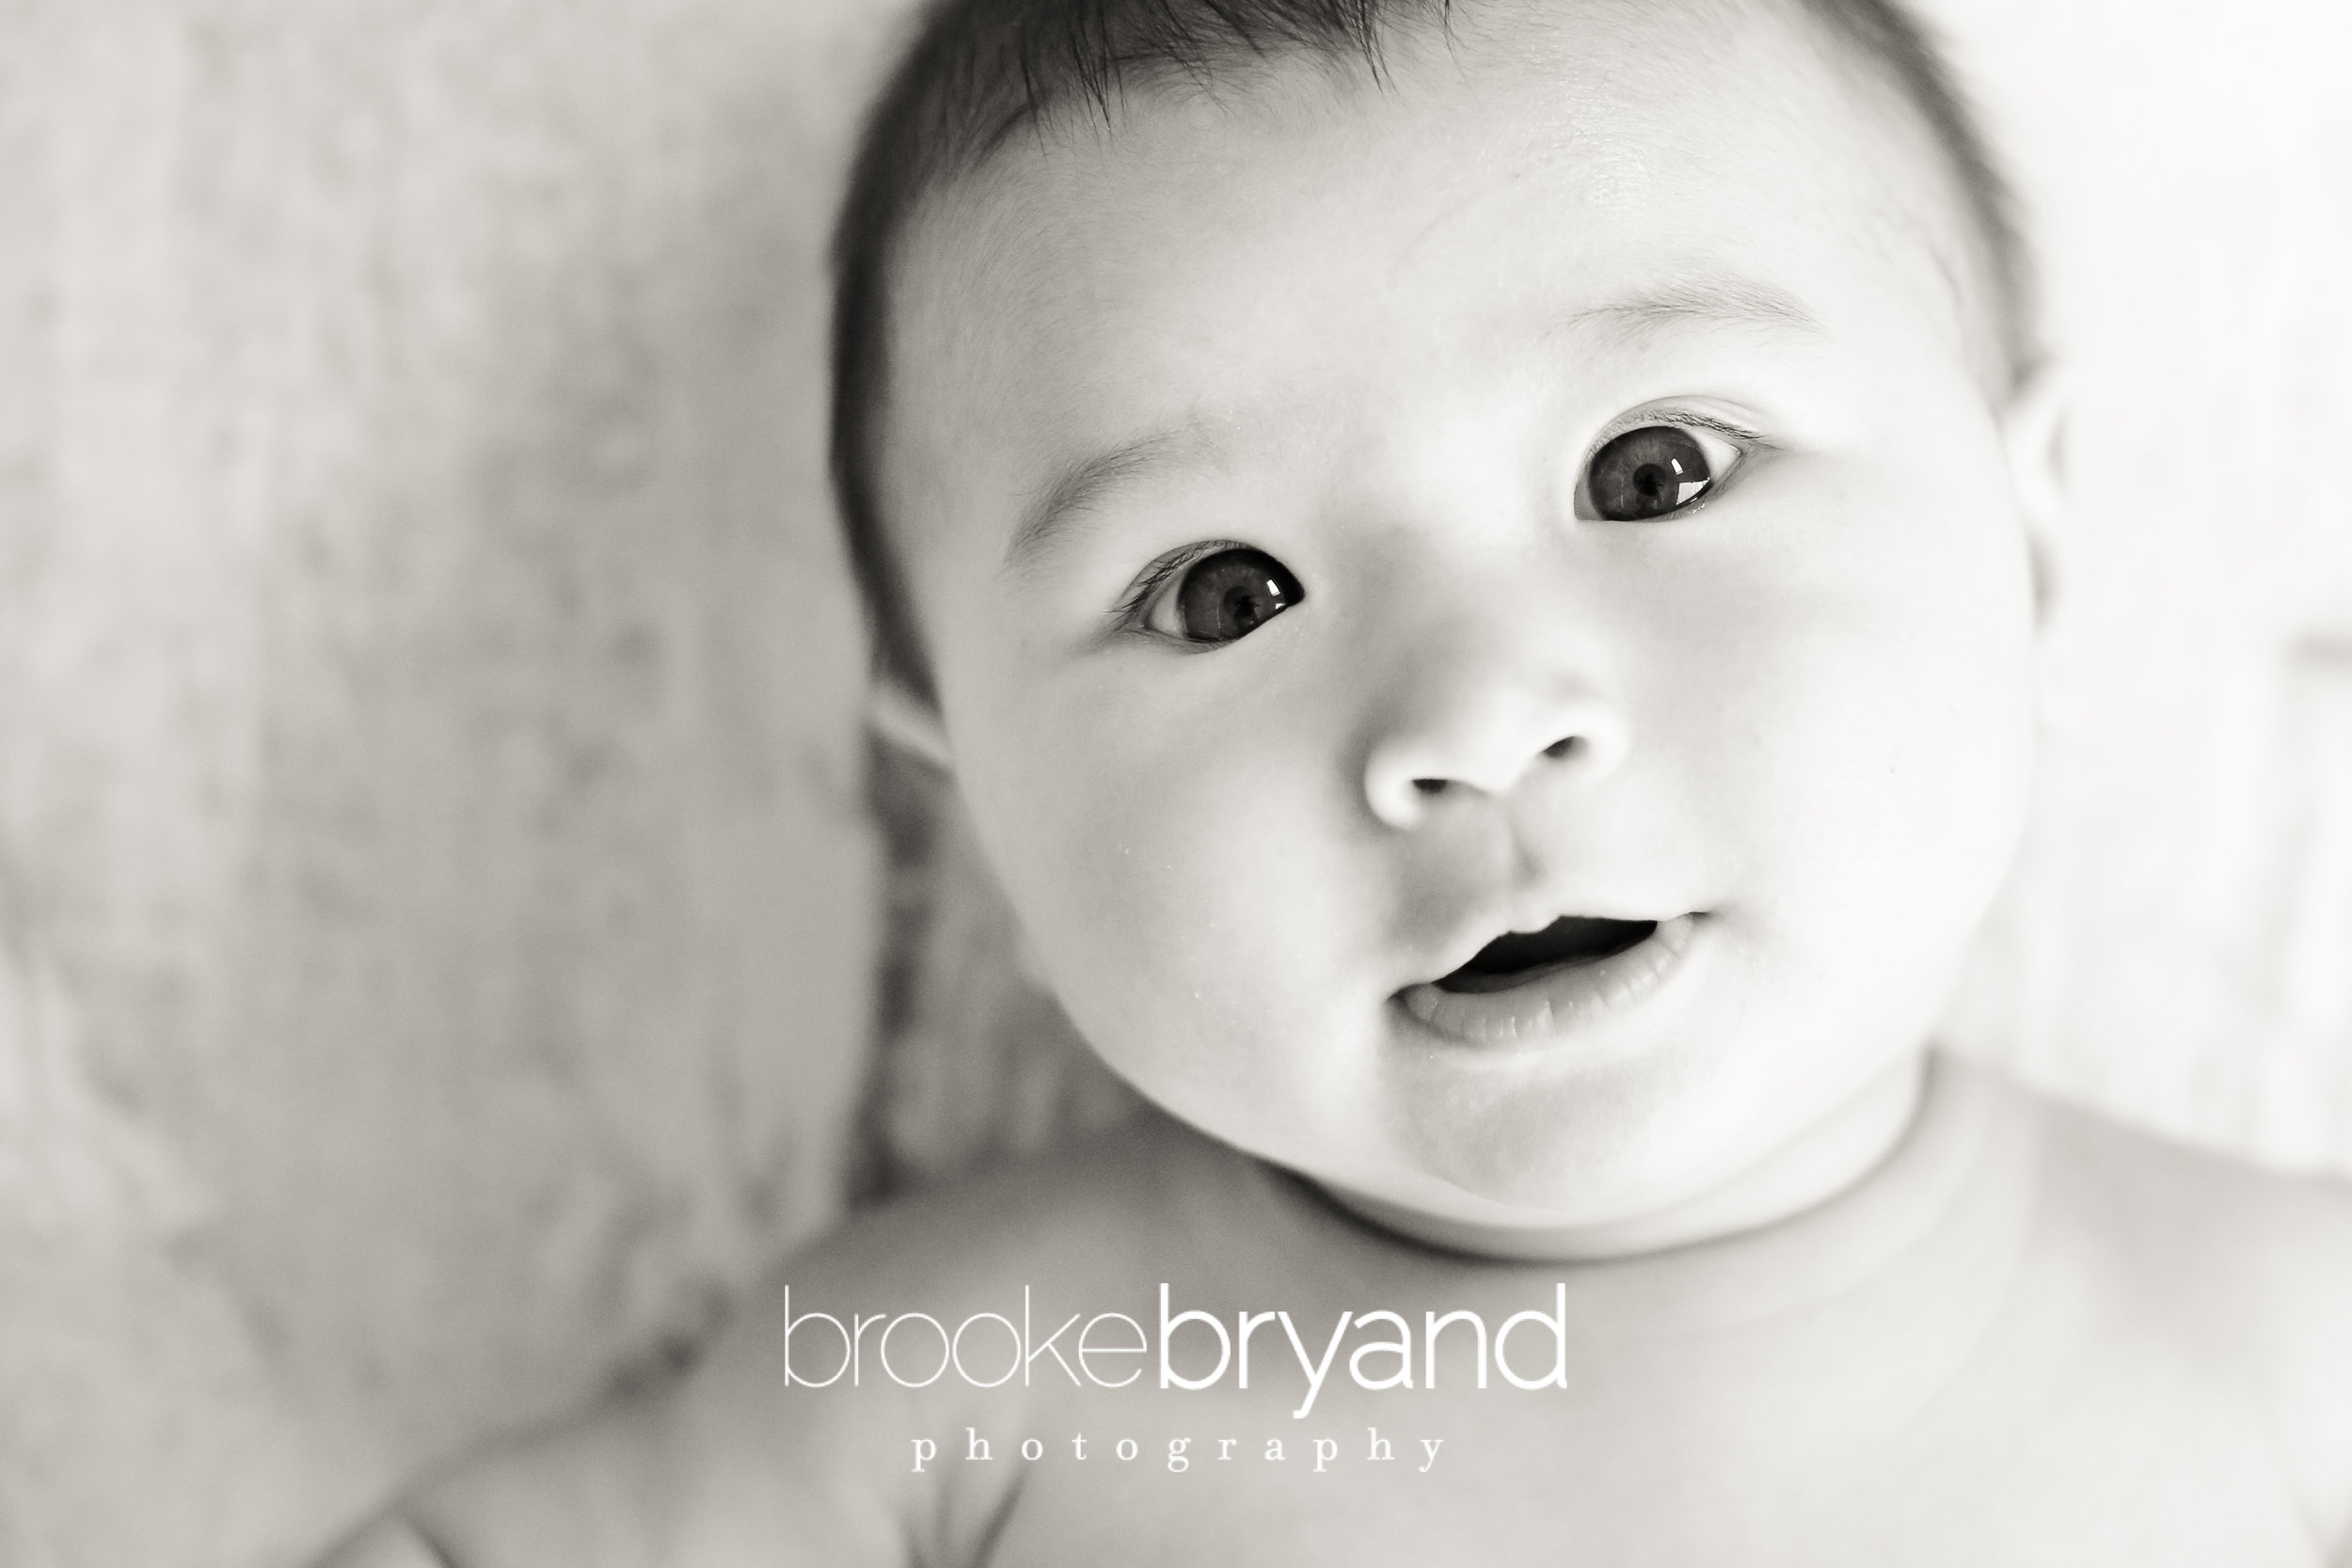 Brooke-Bryand-Photography-San-Francisco-Baby-Photographer-IMG_9634.jpg